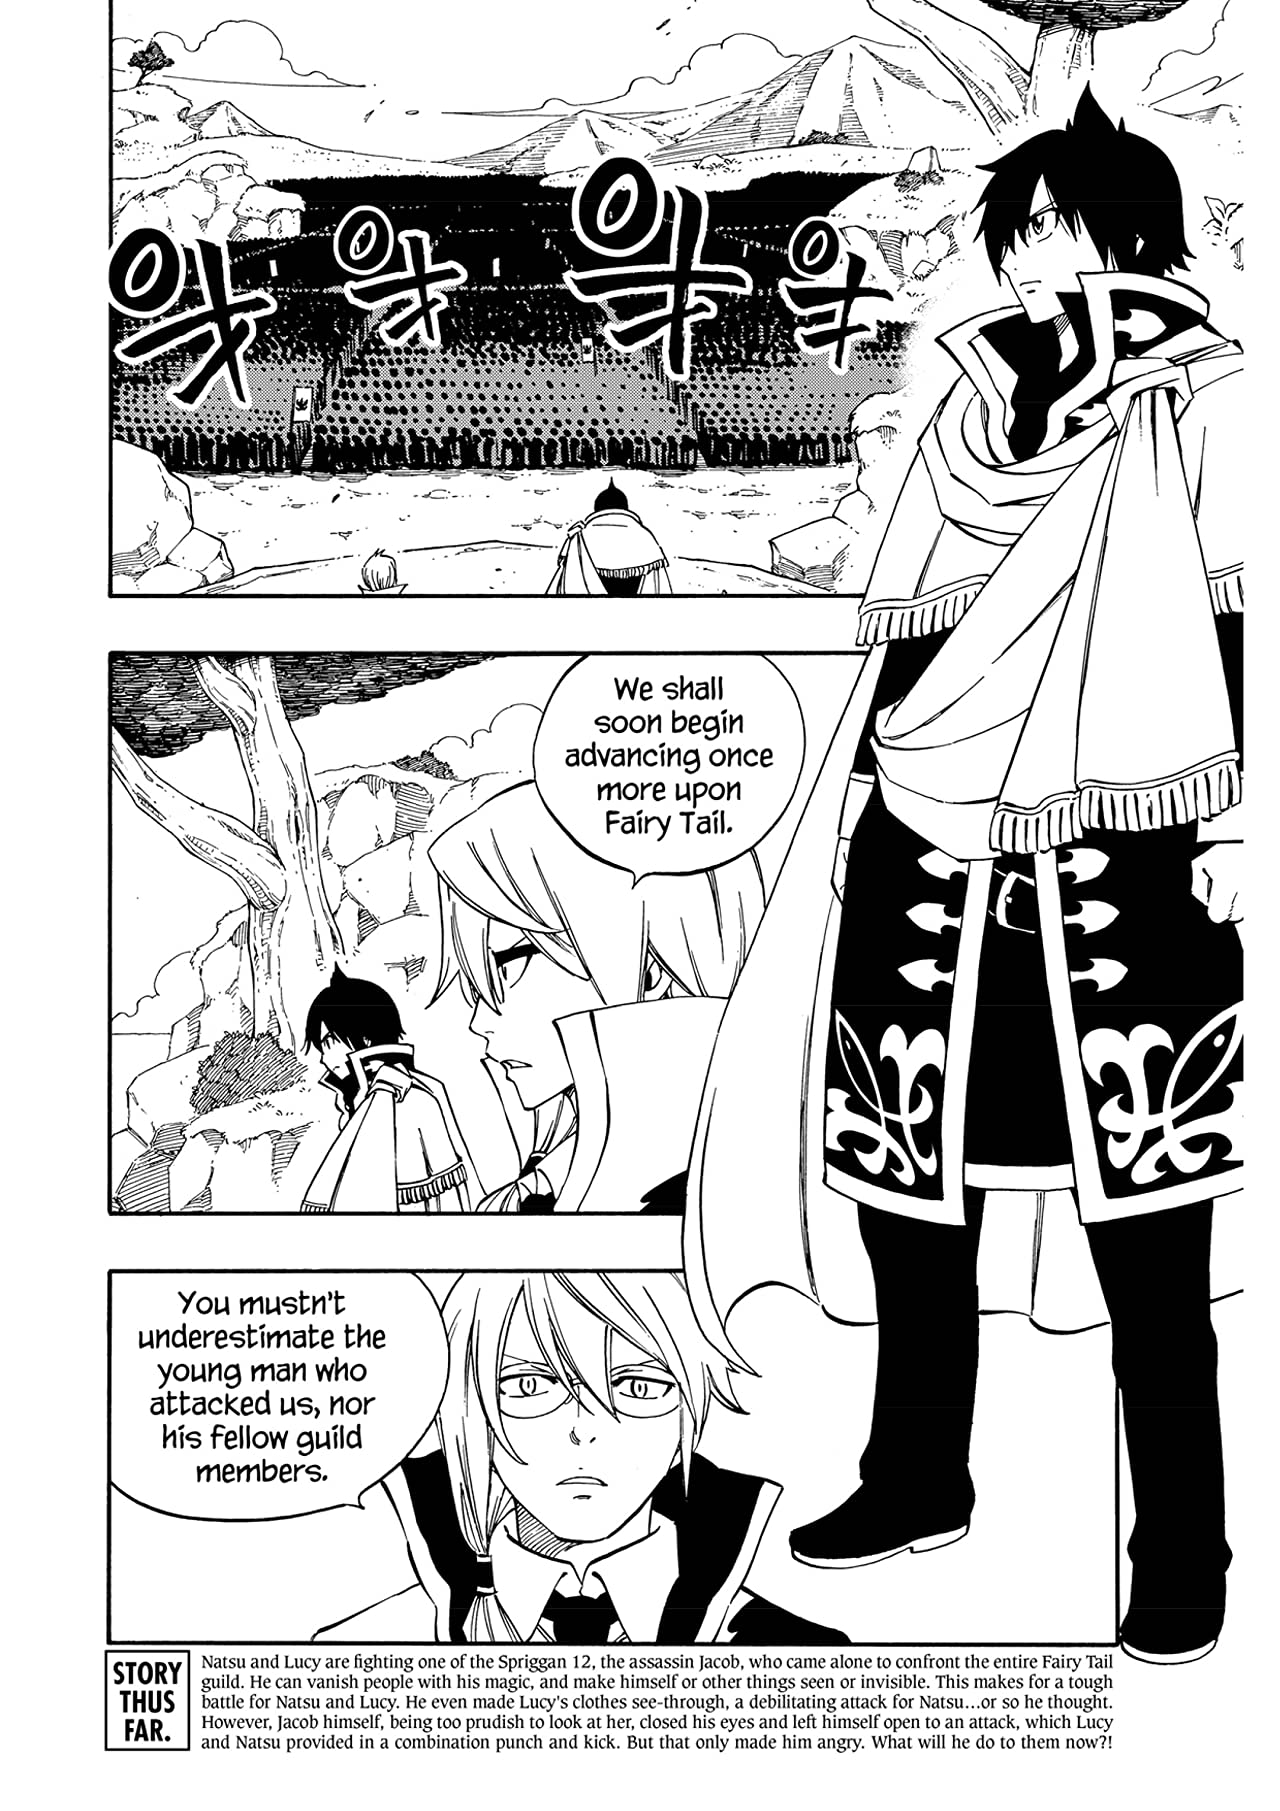 Fairy Tail #479